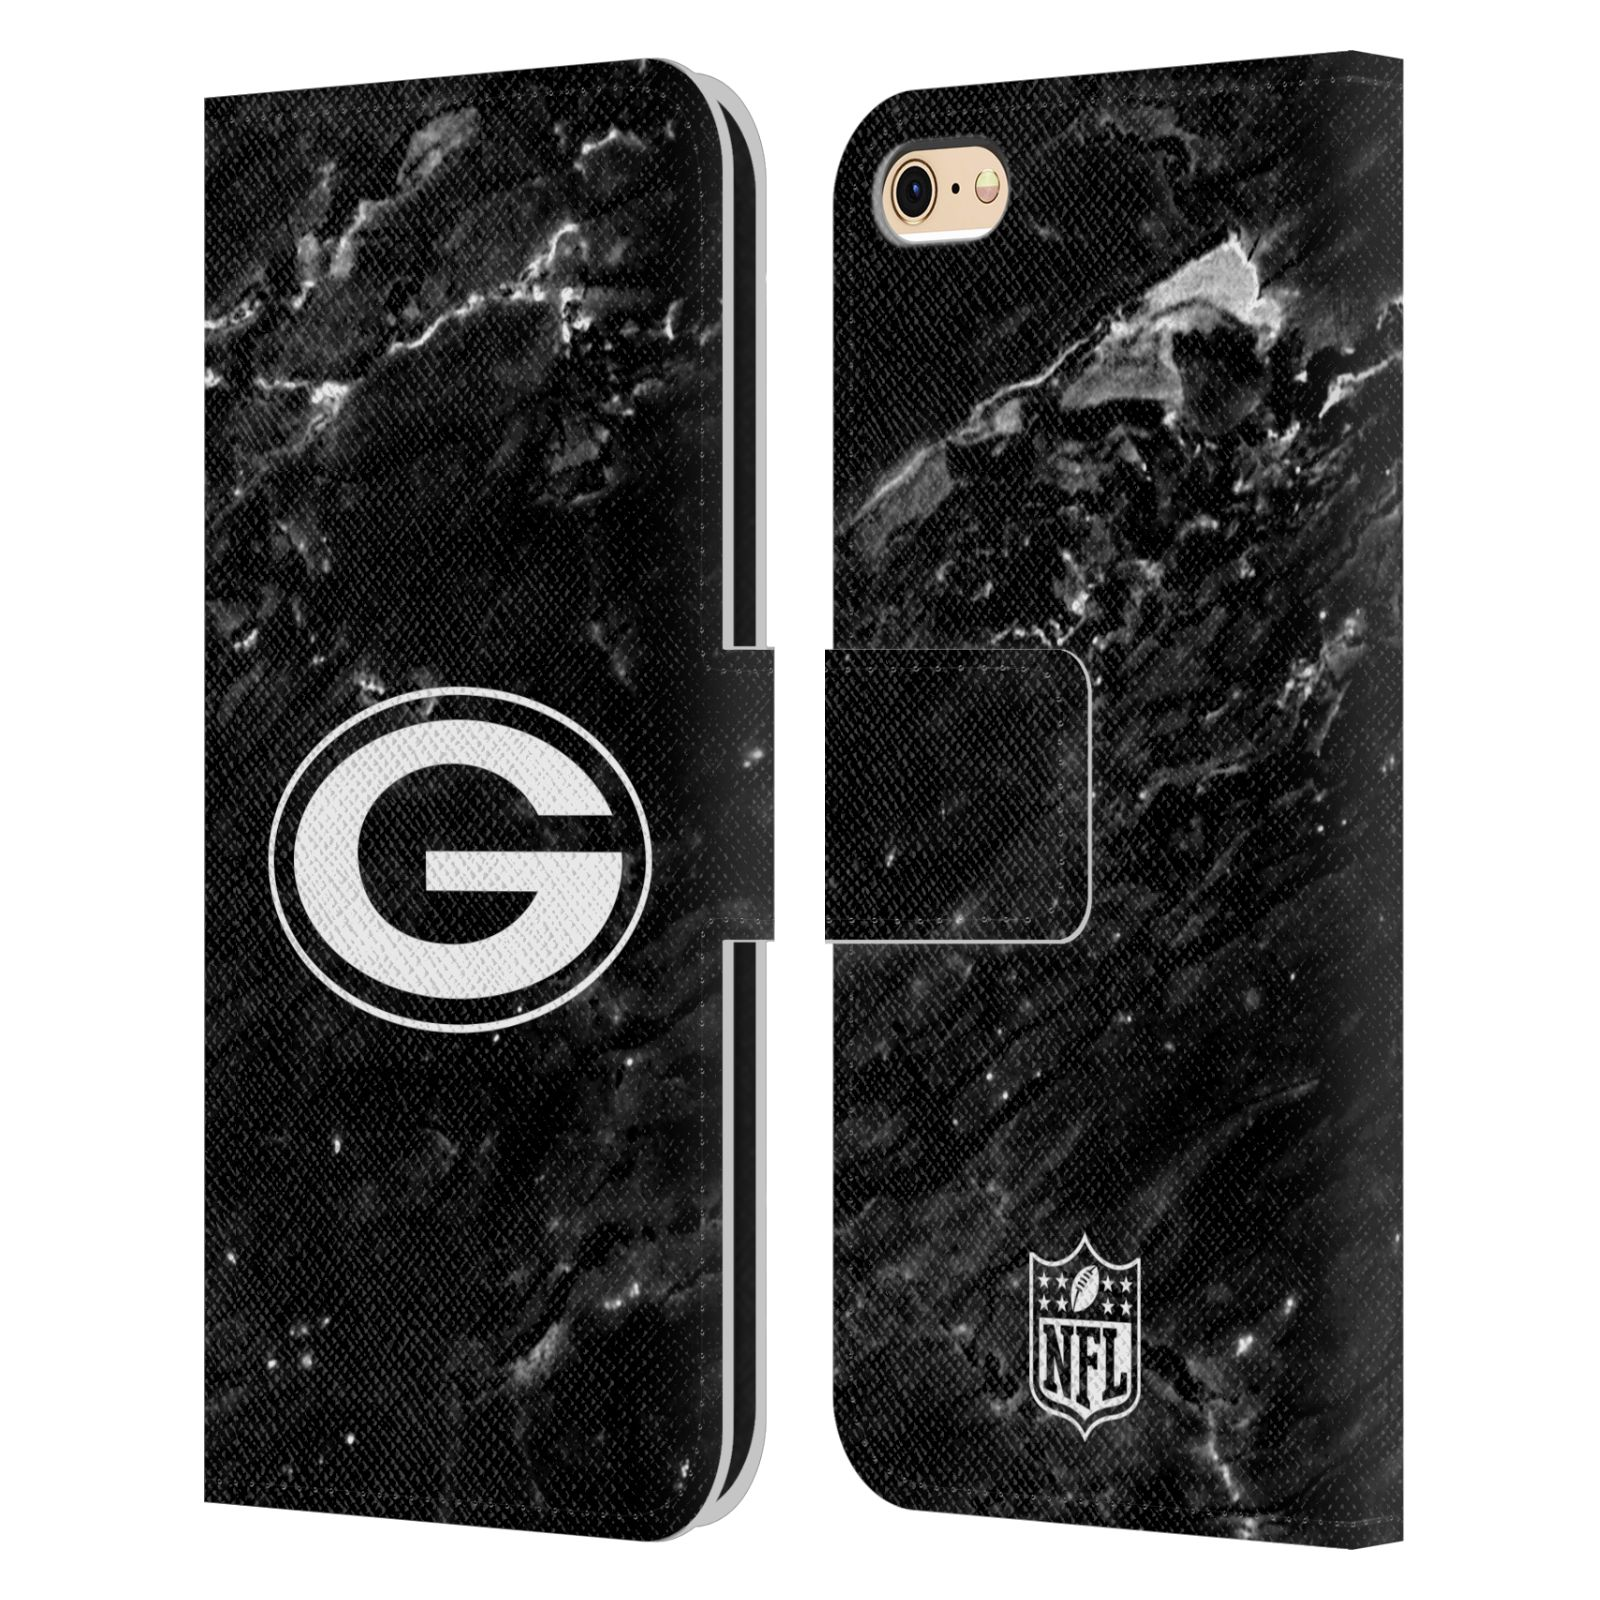 NFL-2017-18-GREEN-BAY-PACKERS-COVER-A-PORTAFOGLIO-PER-APPLE-iPHONE-TELEFONI